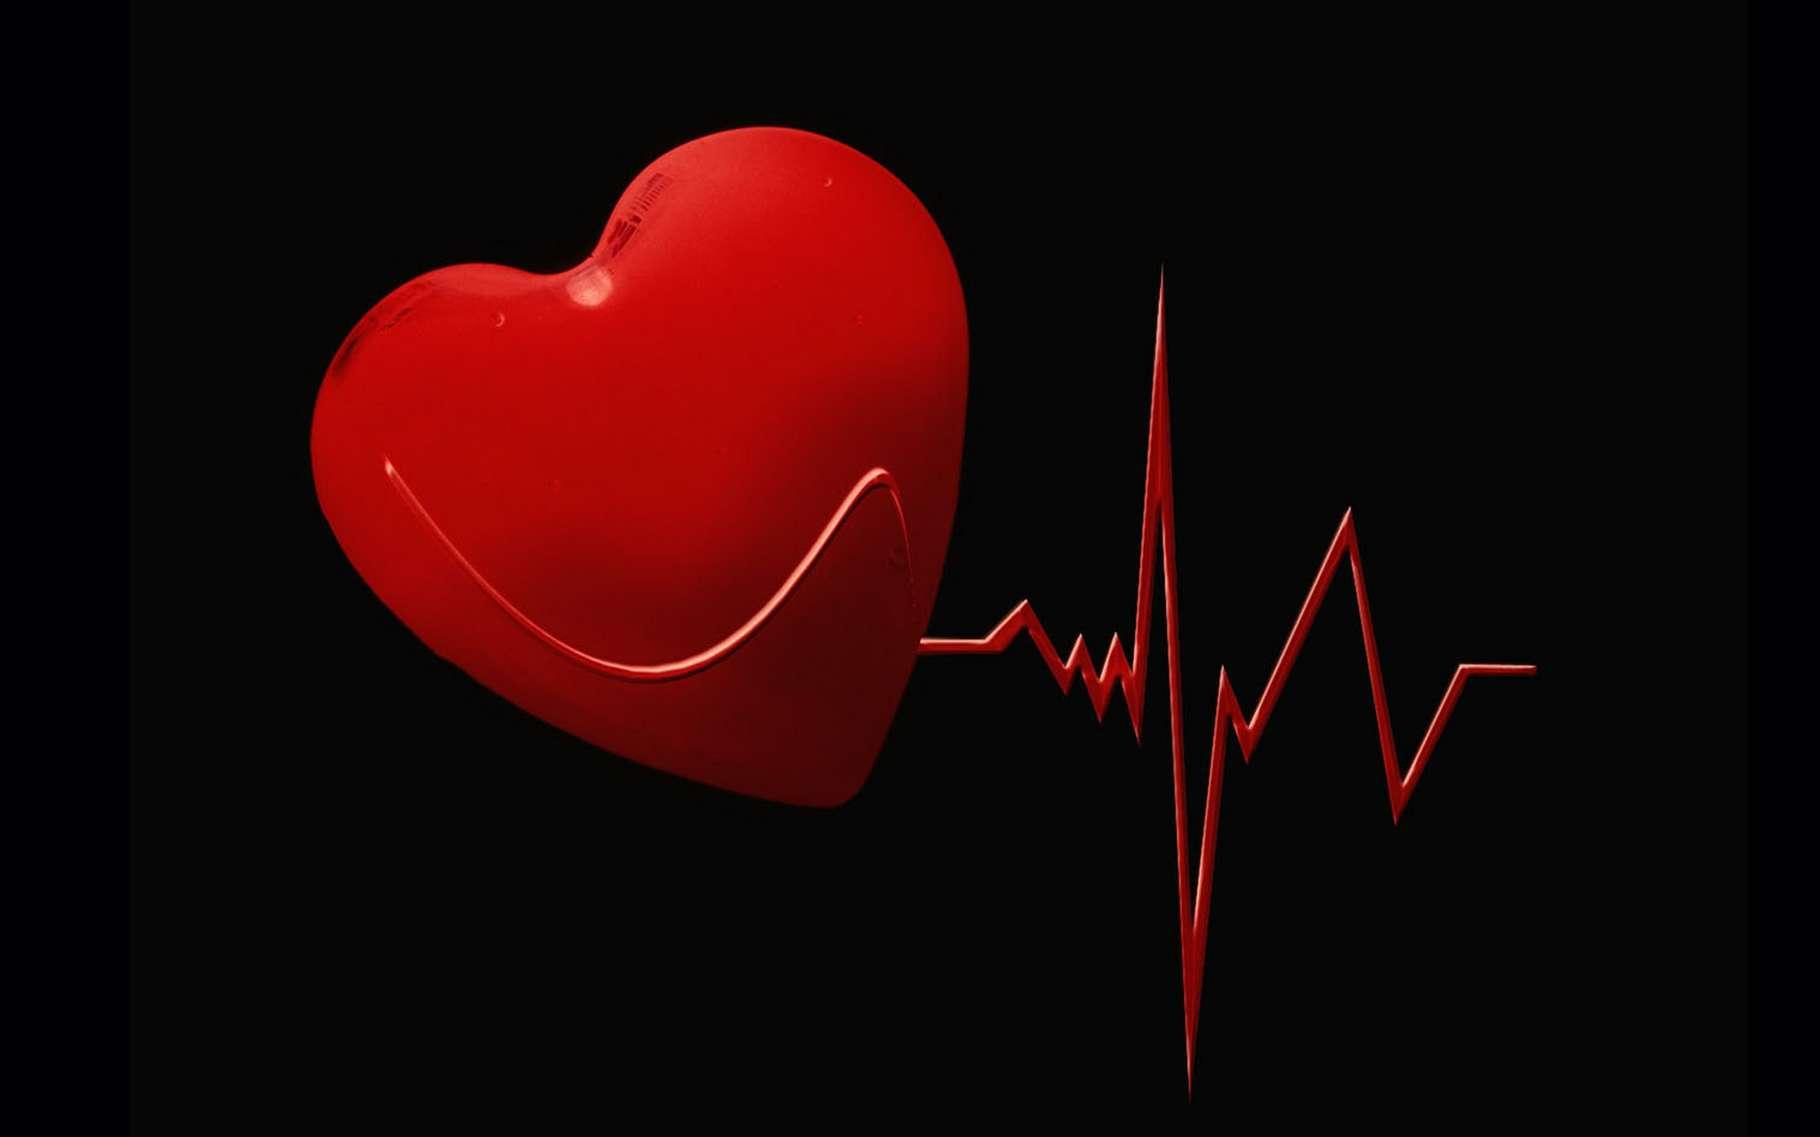 Automesure de la tension artérielle - Dossier